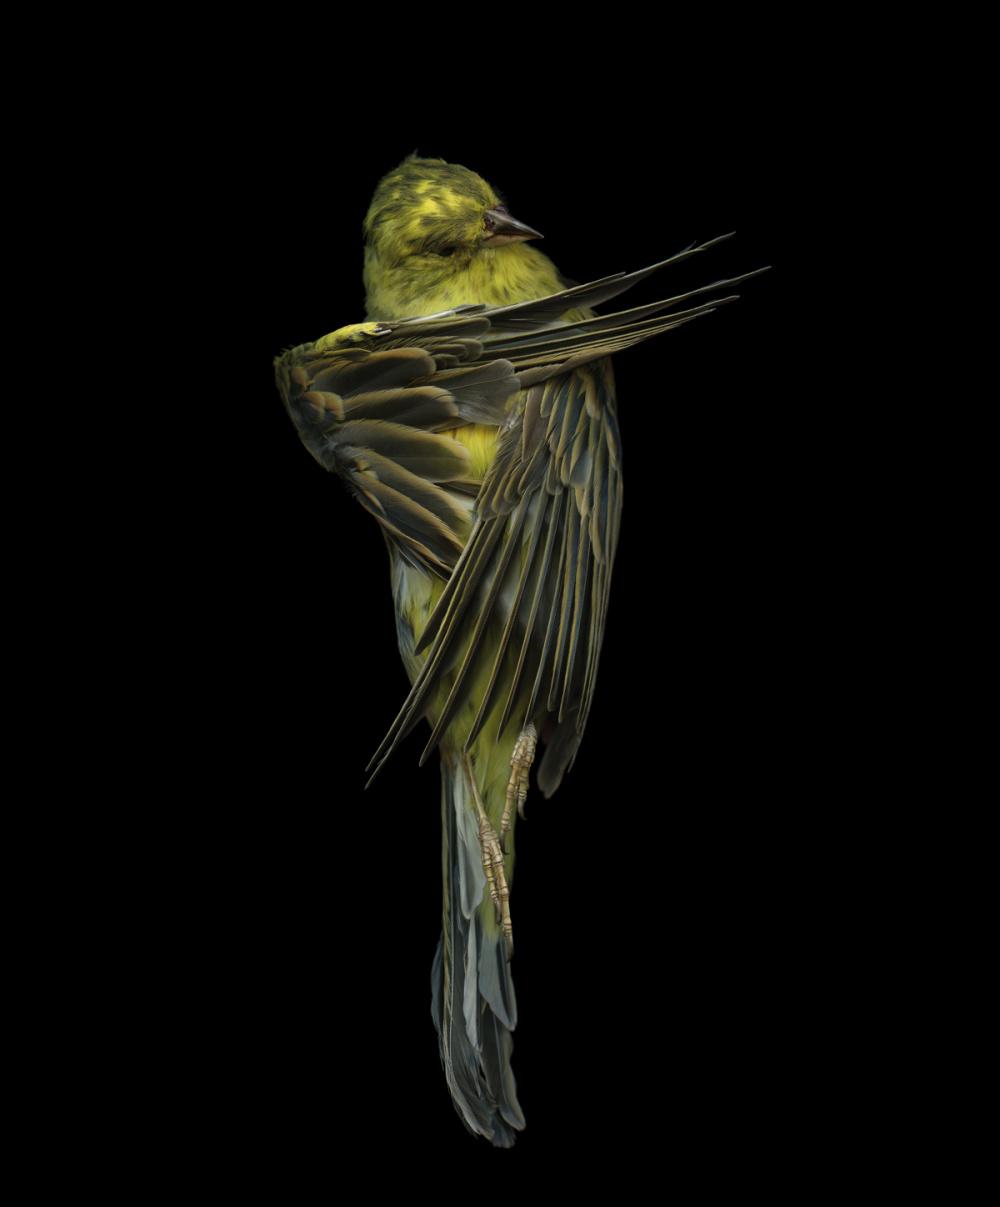 Edgar Leciejewski, Yellowhammer #07, 2009. From the series